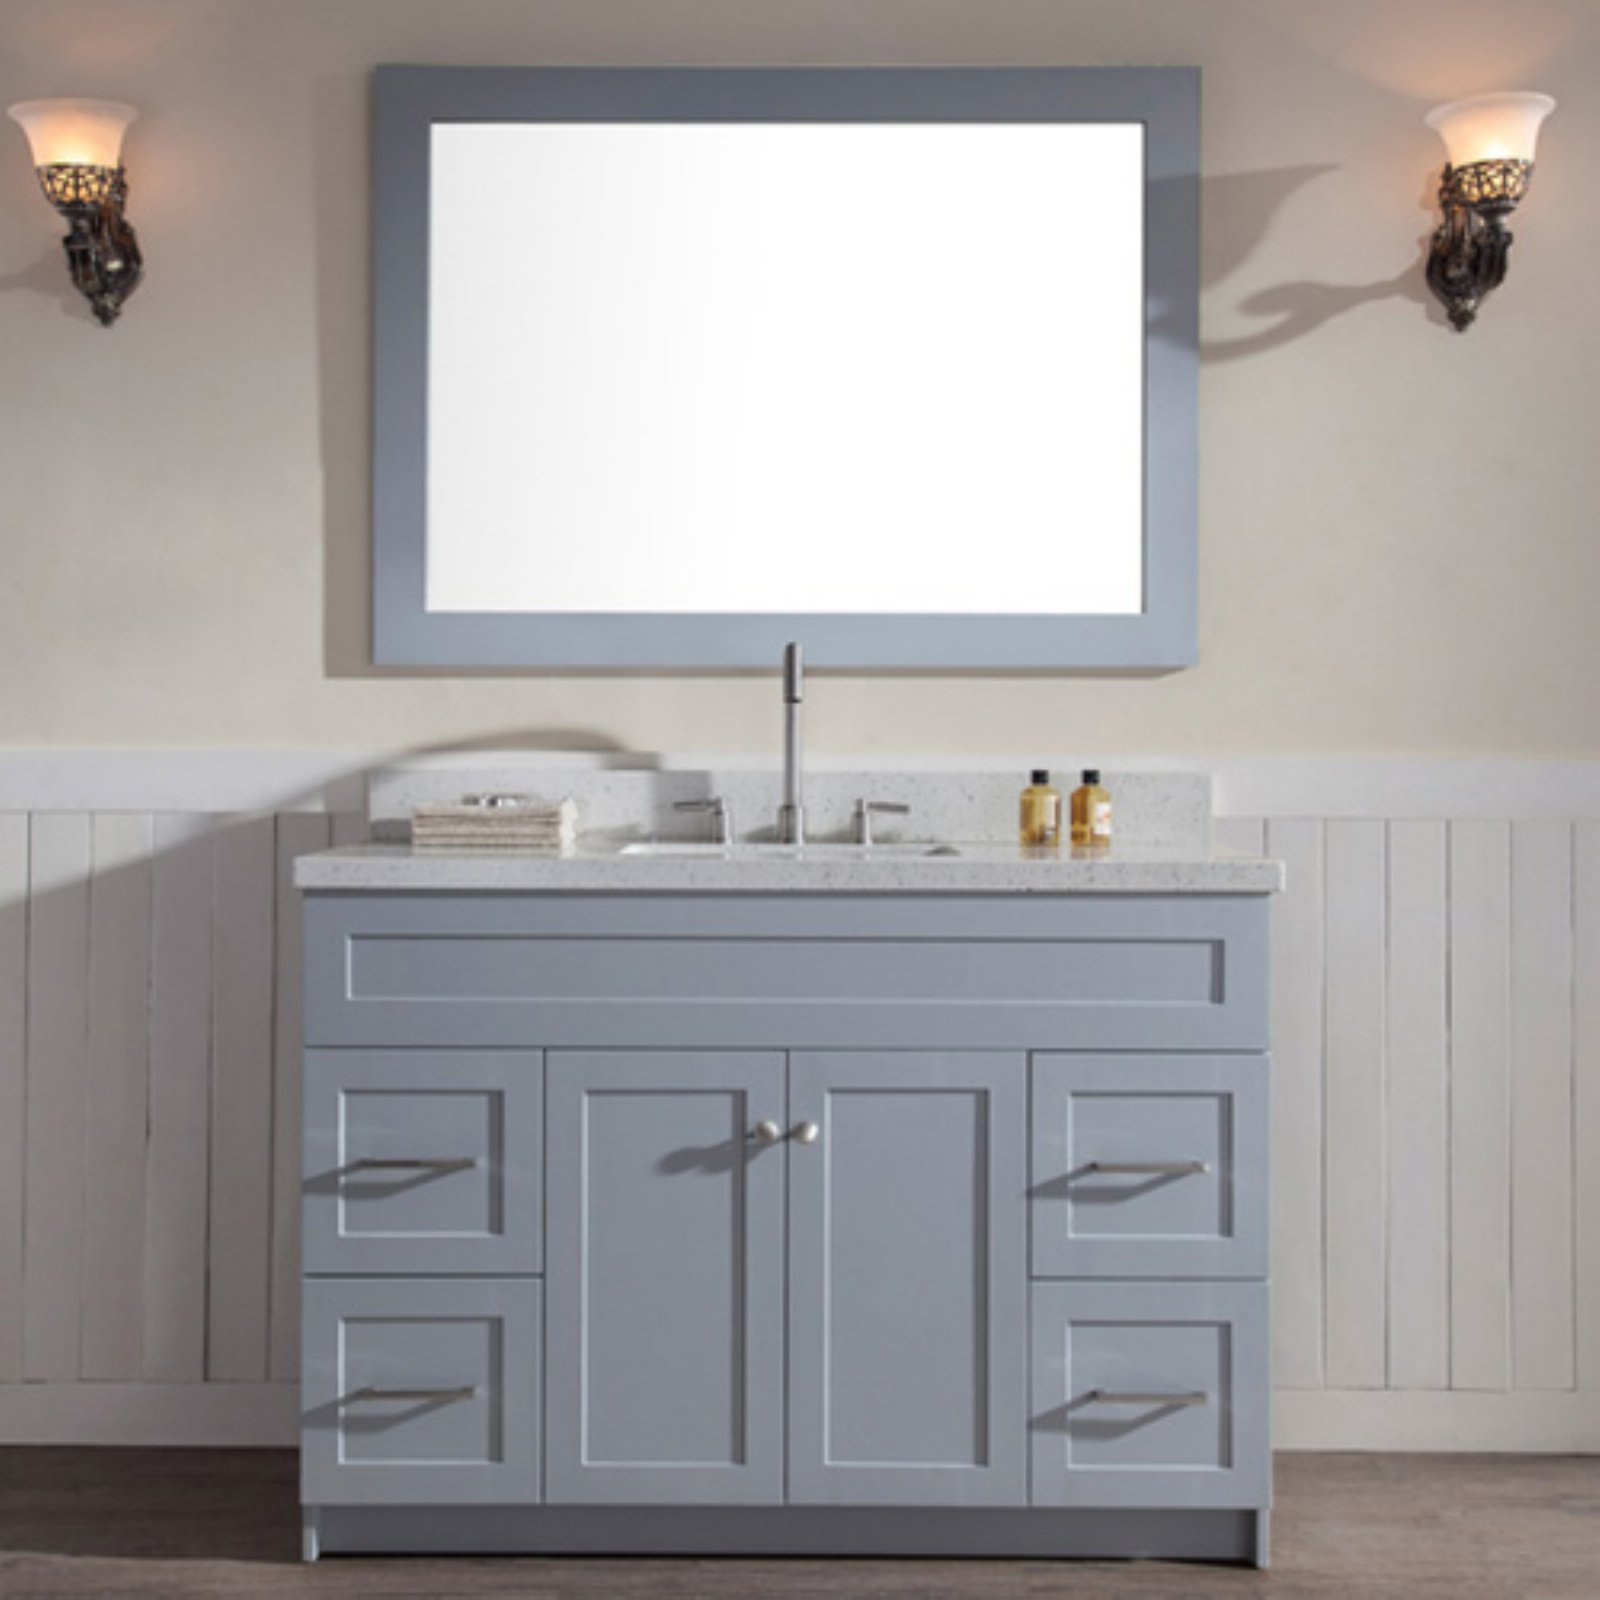 Ariel Hamlet 49 In Bath Vanity In Grey With Quartz Vanity Top In White With White Basin And Mirror Walmart Com Walmart Com